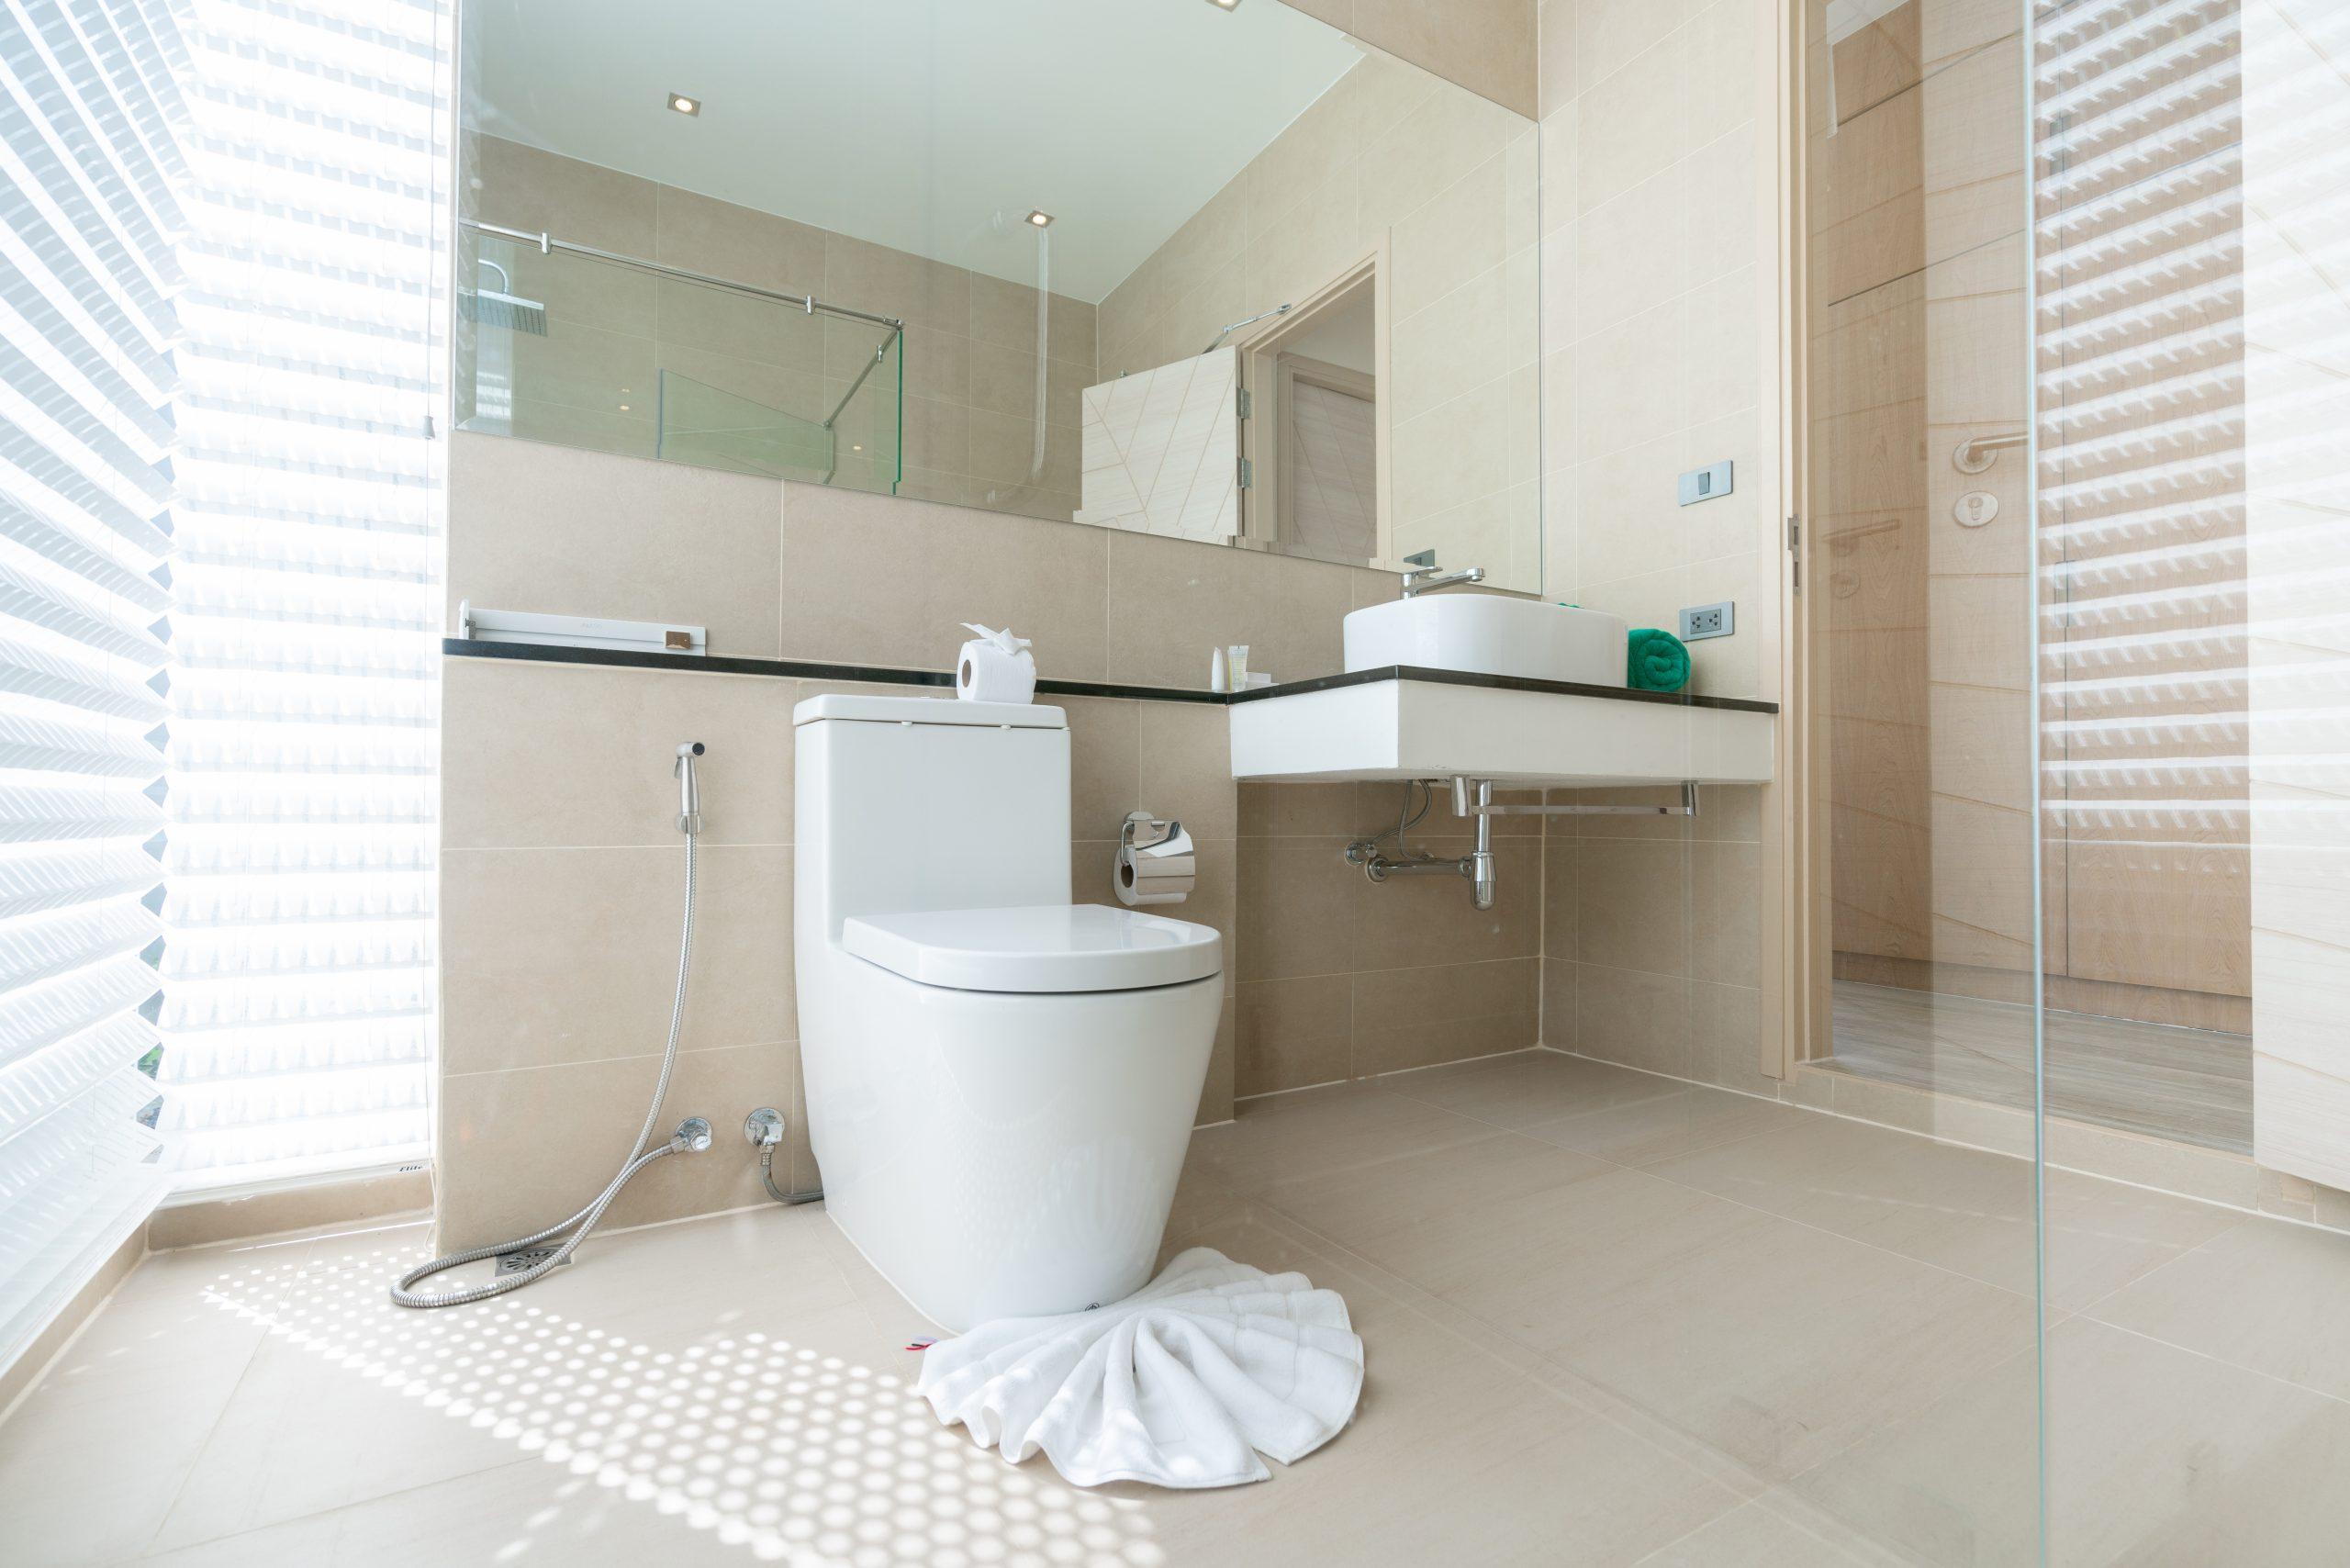 Best Toilet for Flushing Large Poop